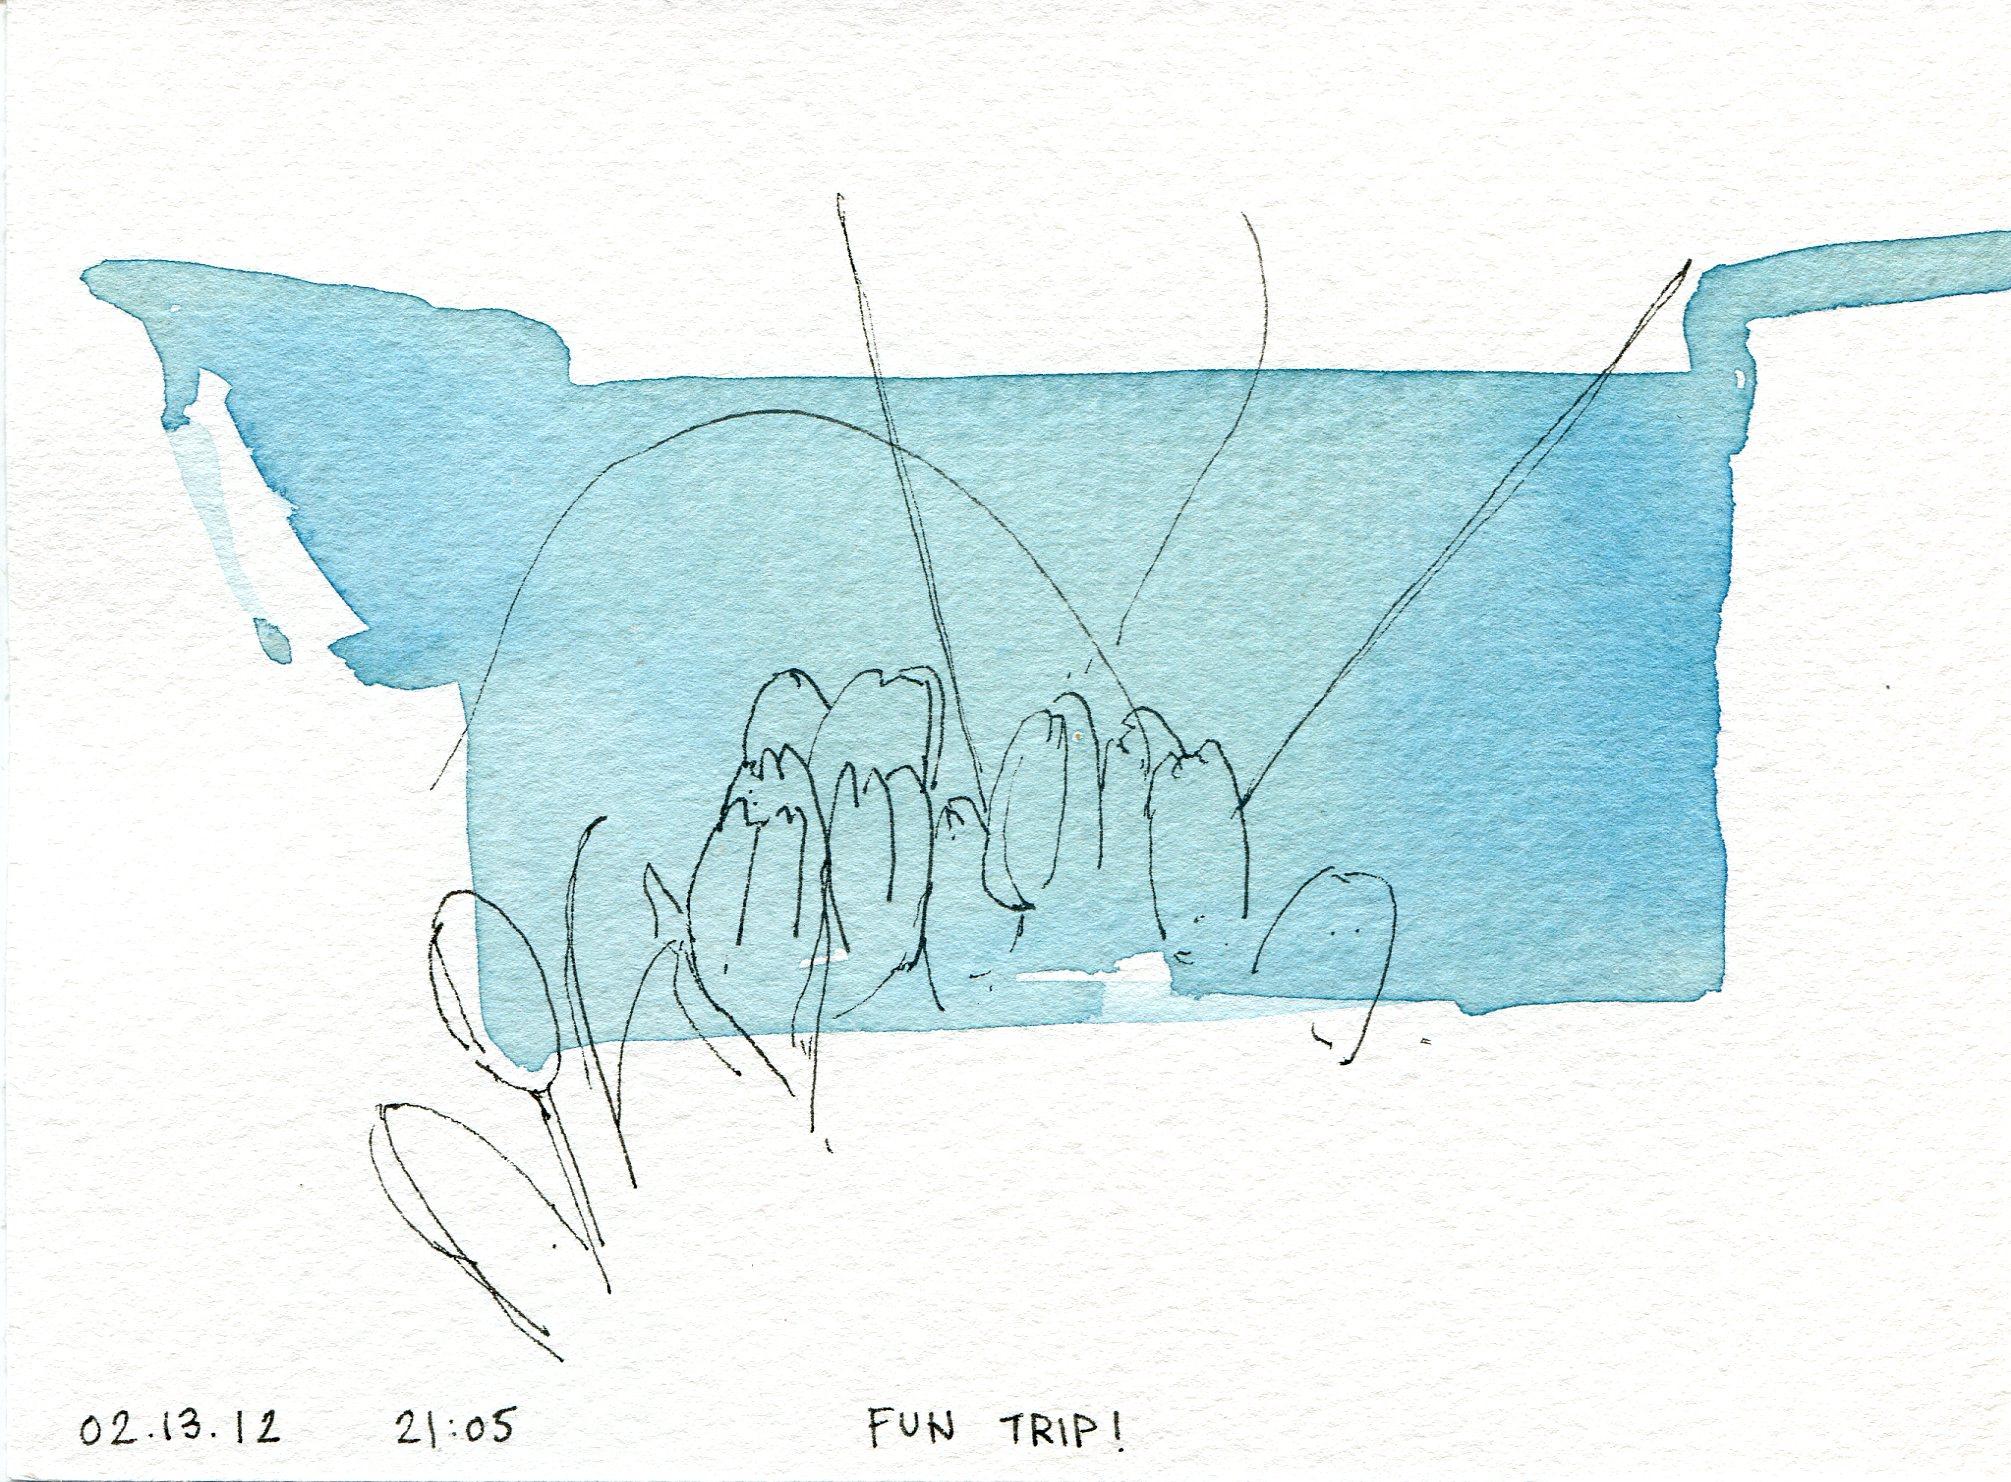 2012-02-17 drawing002.jpg